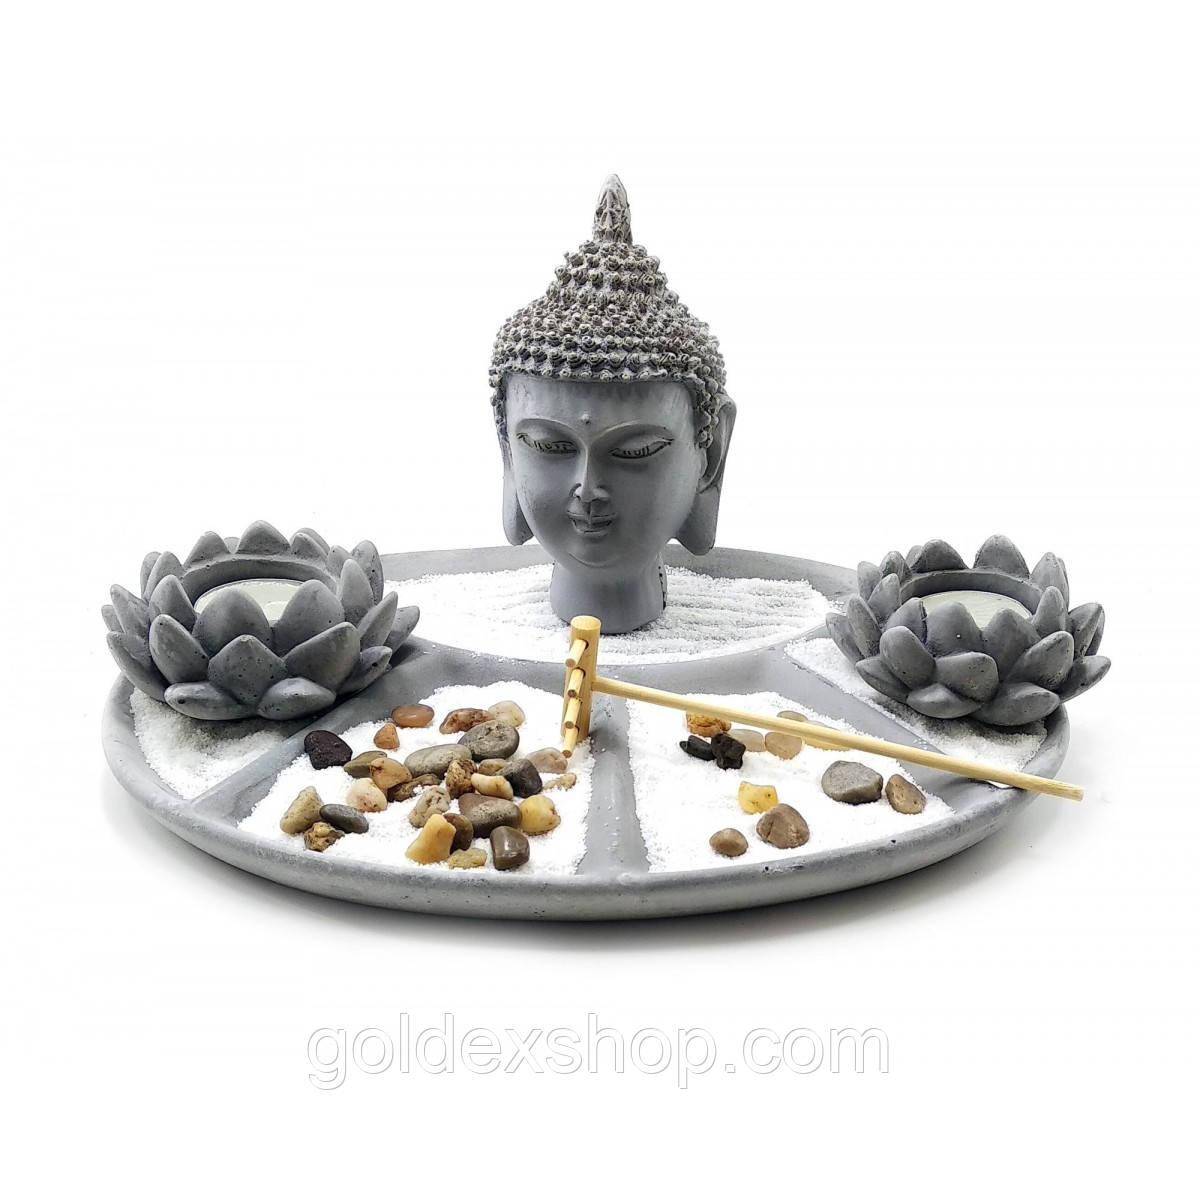 "Сад камней ""Будда"" (Сад дзен) (27,5х21,5х17 см)"